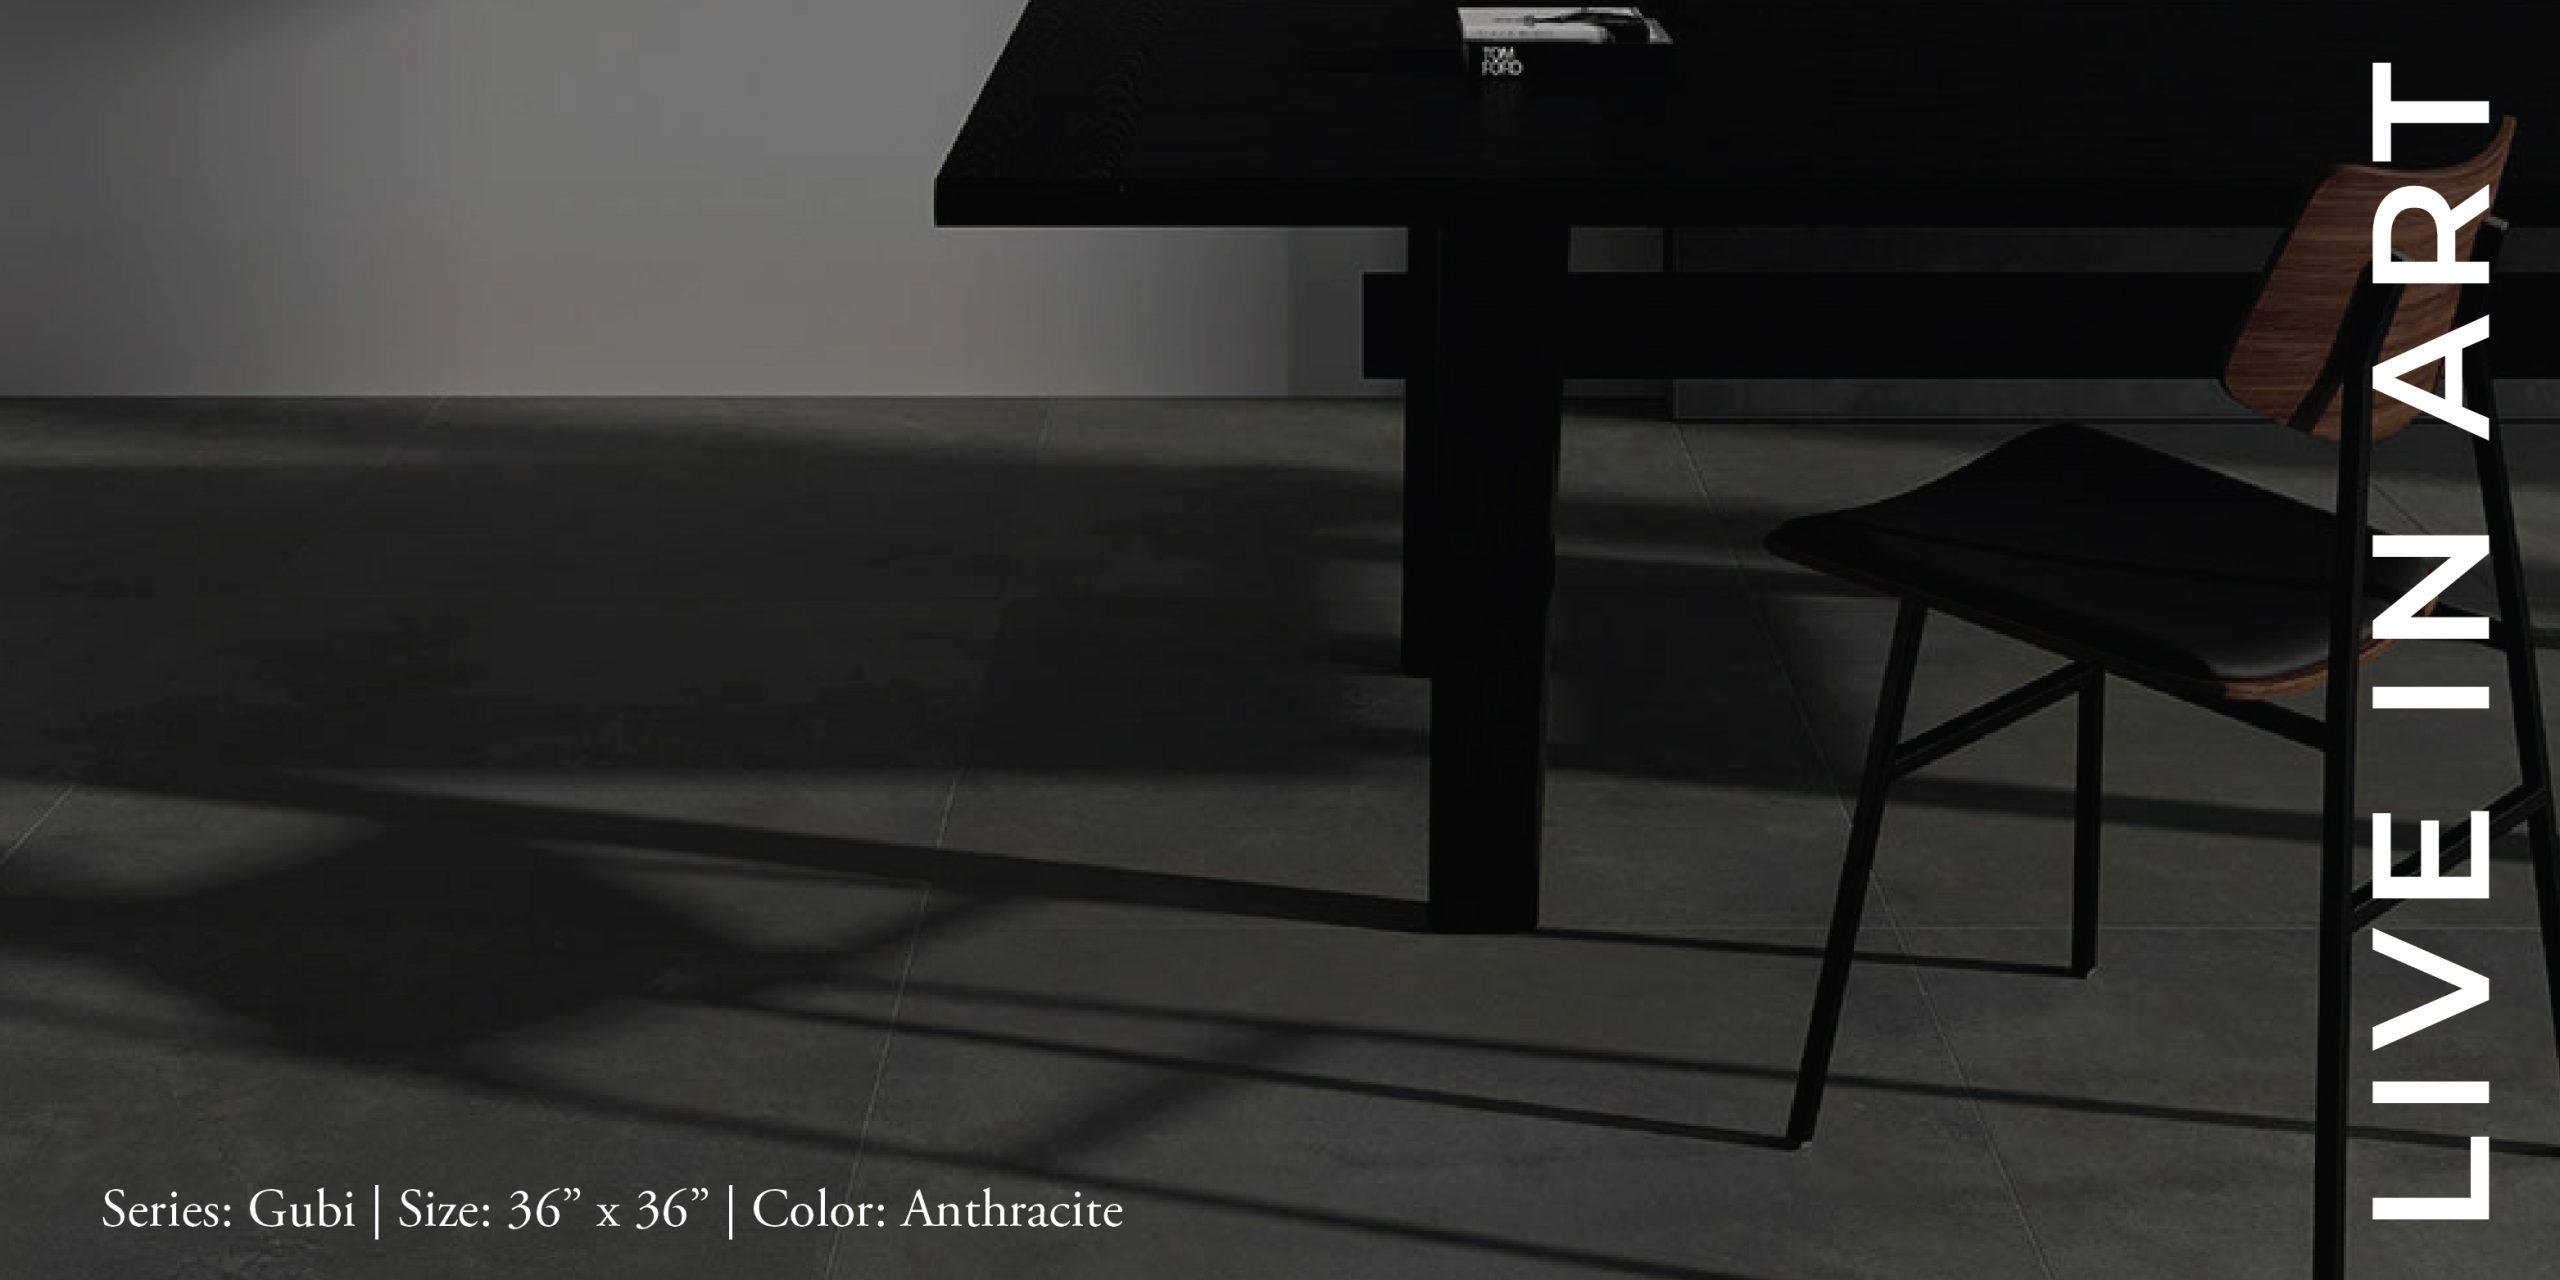 Gubi Anthracite 36x36